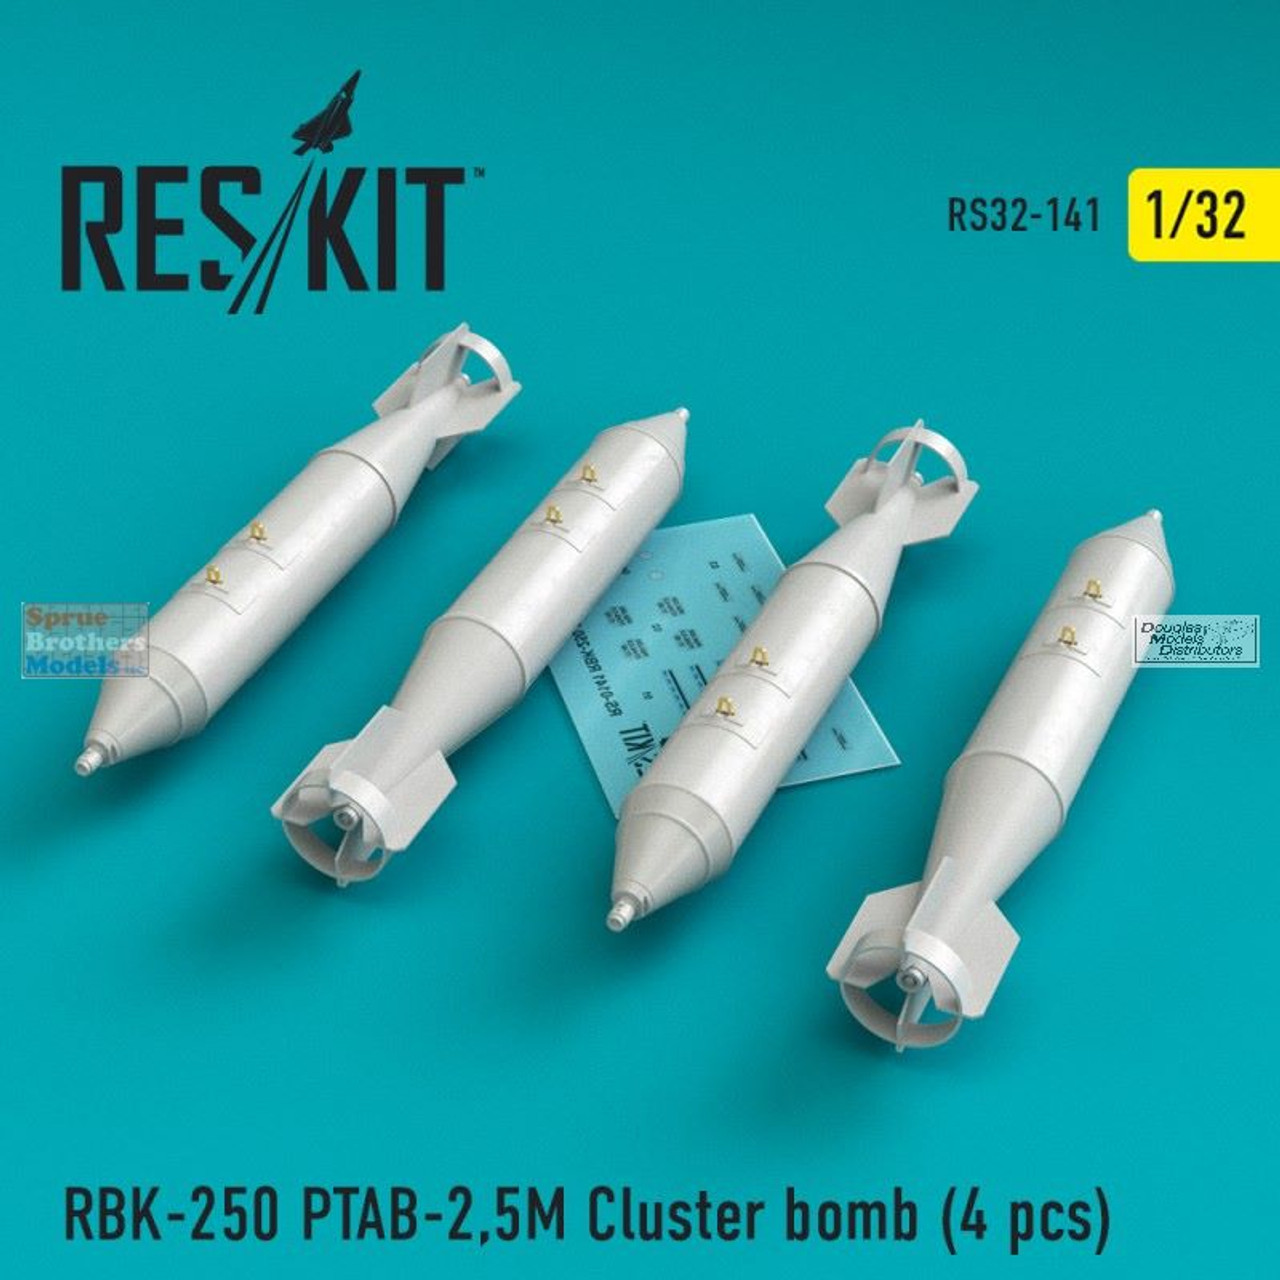 RESRS320141 1:32 ResKit RBK-250 PTAB-2.5M Cluster Bomb Set